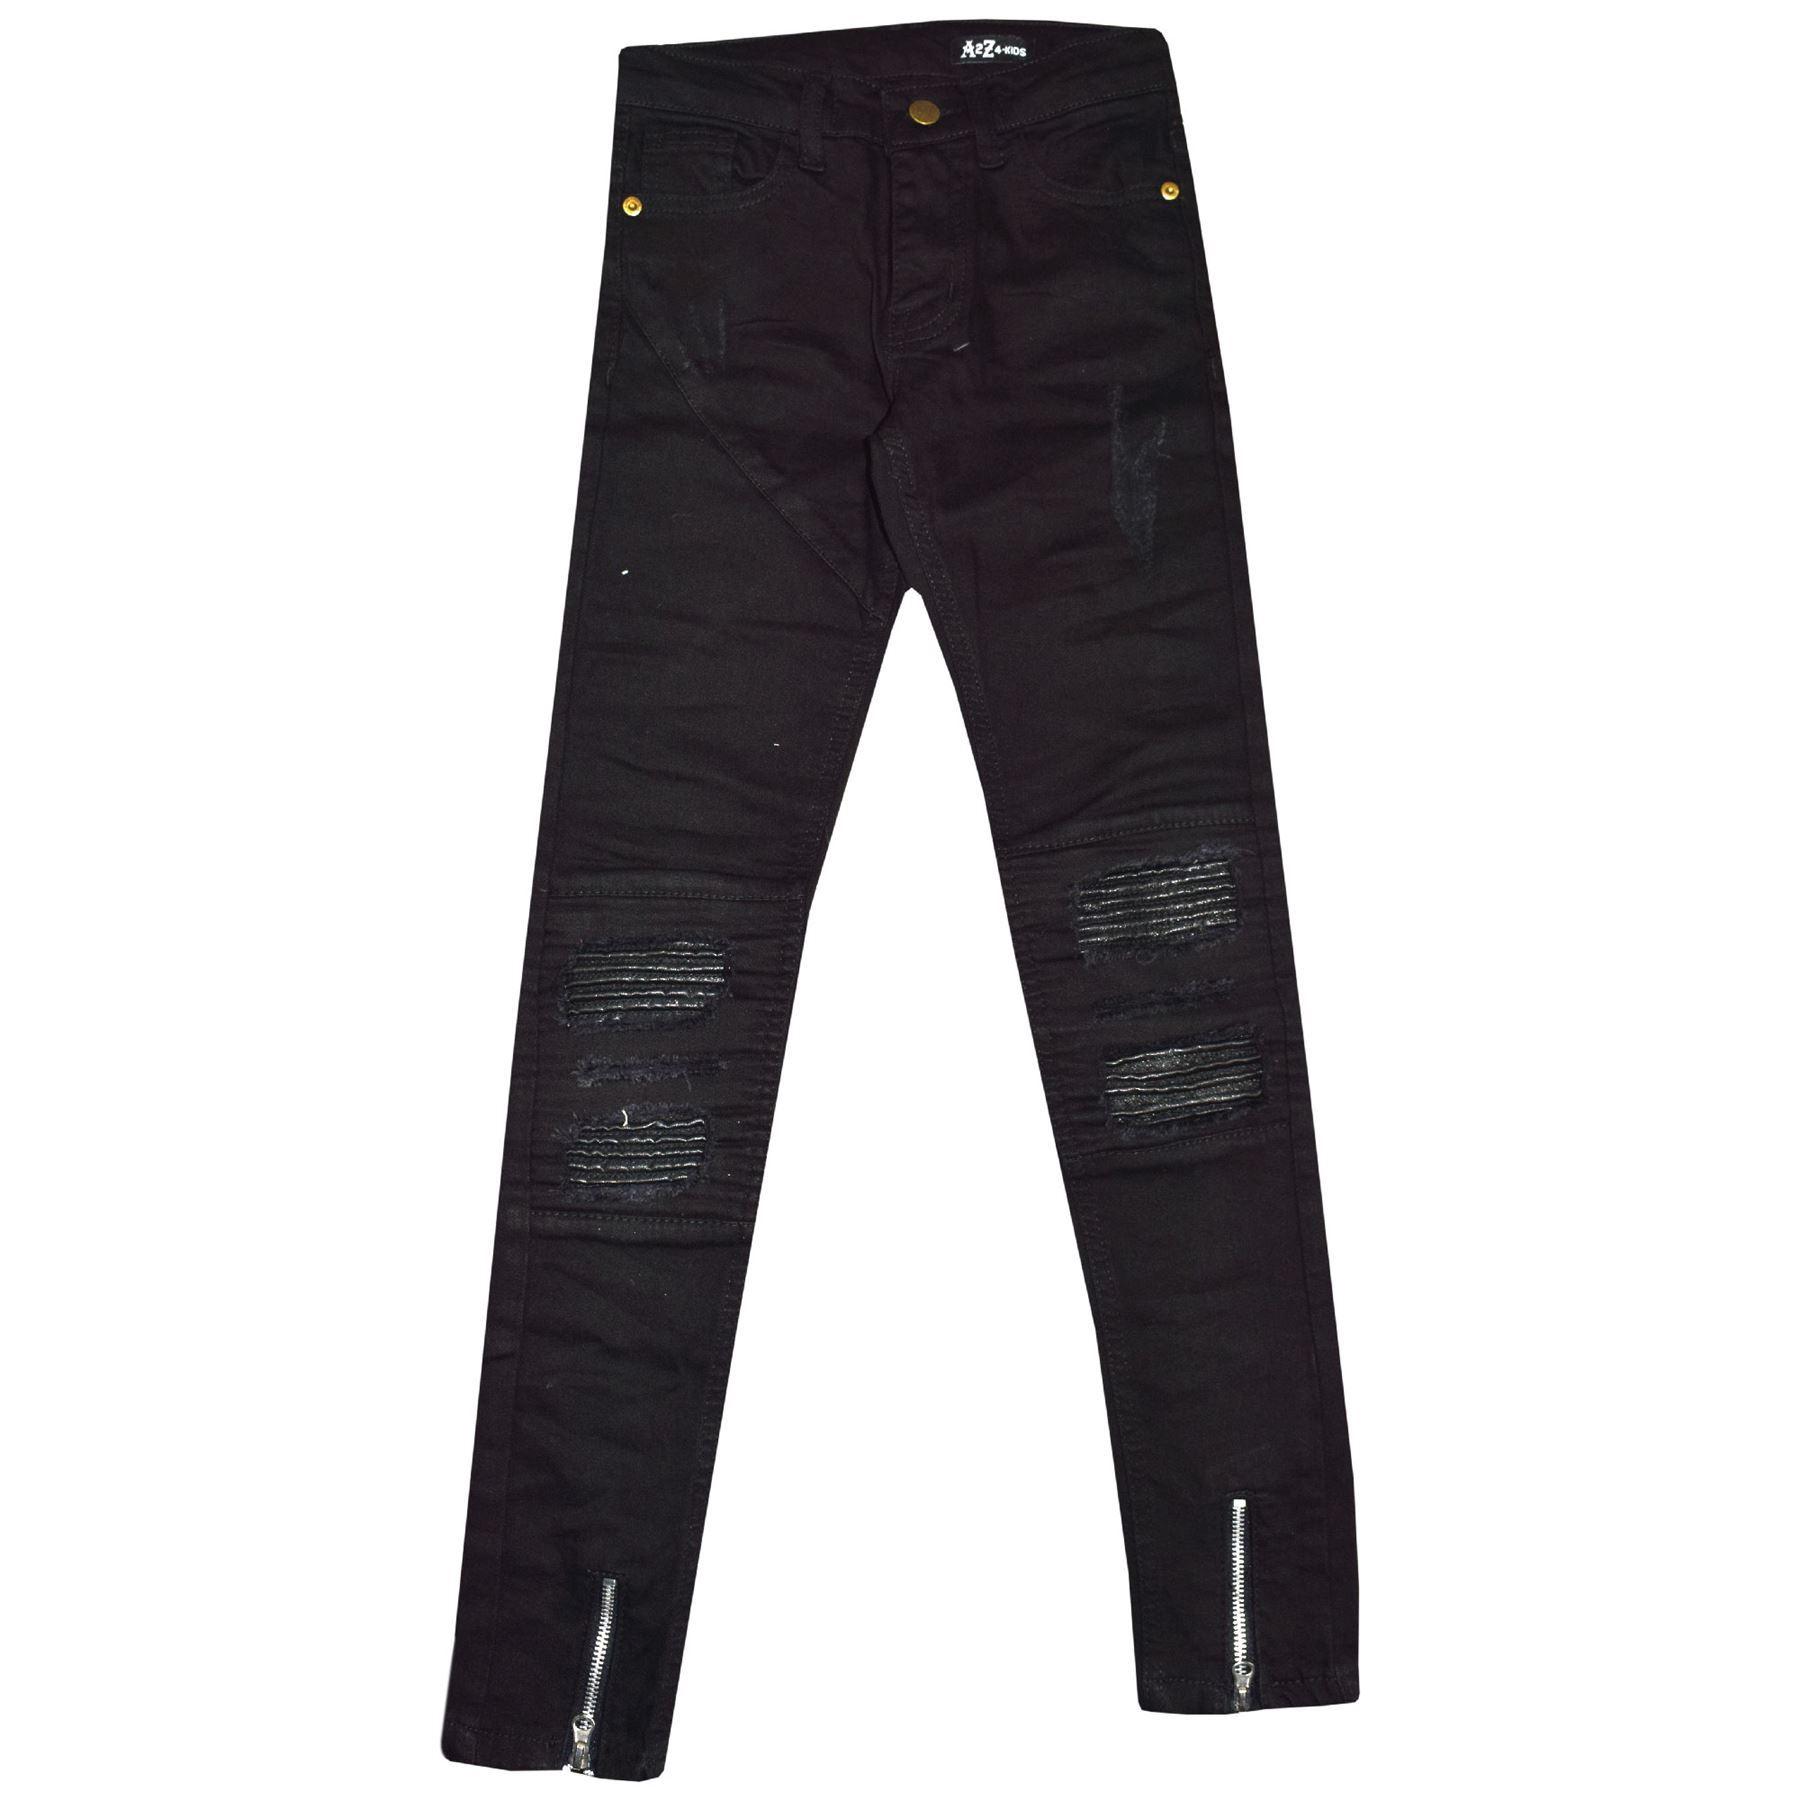 Kids Girls Stretchy Jeans Jet Black Ripped Drape Panel Denim Pants Trouser 5-13Y